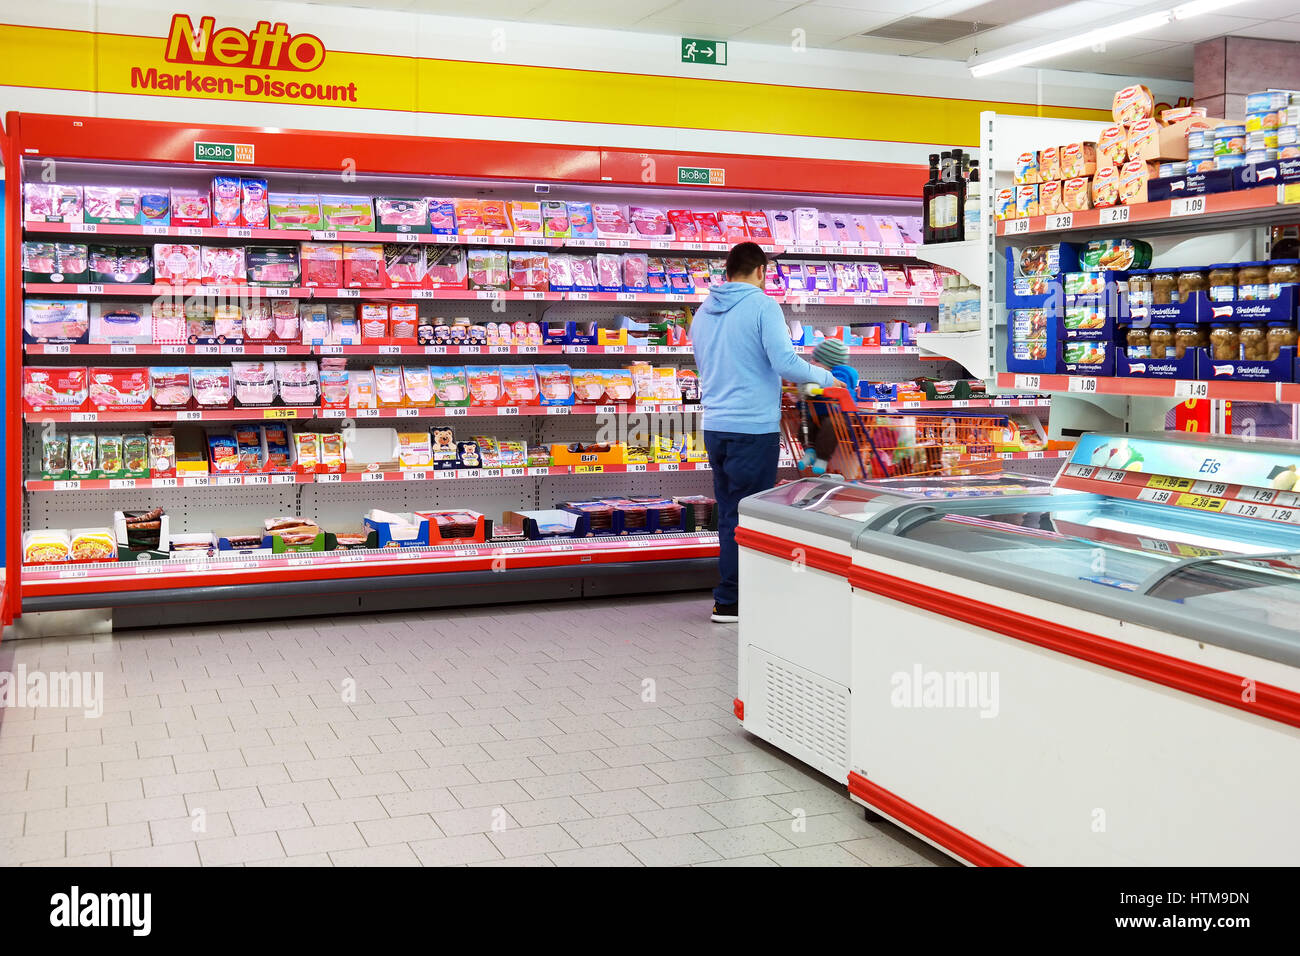 Interior of a Netto Marken Discount supermarket - Stock Image